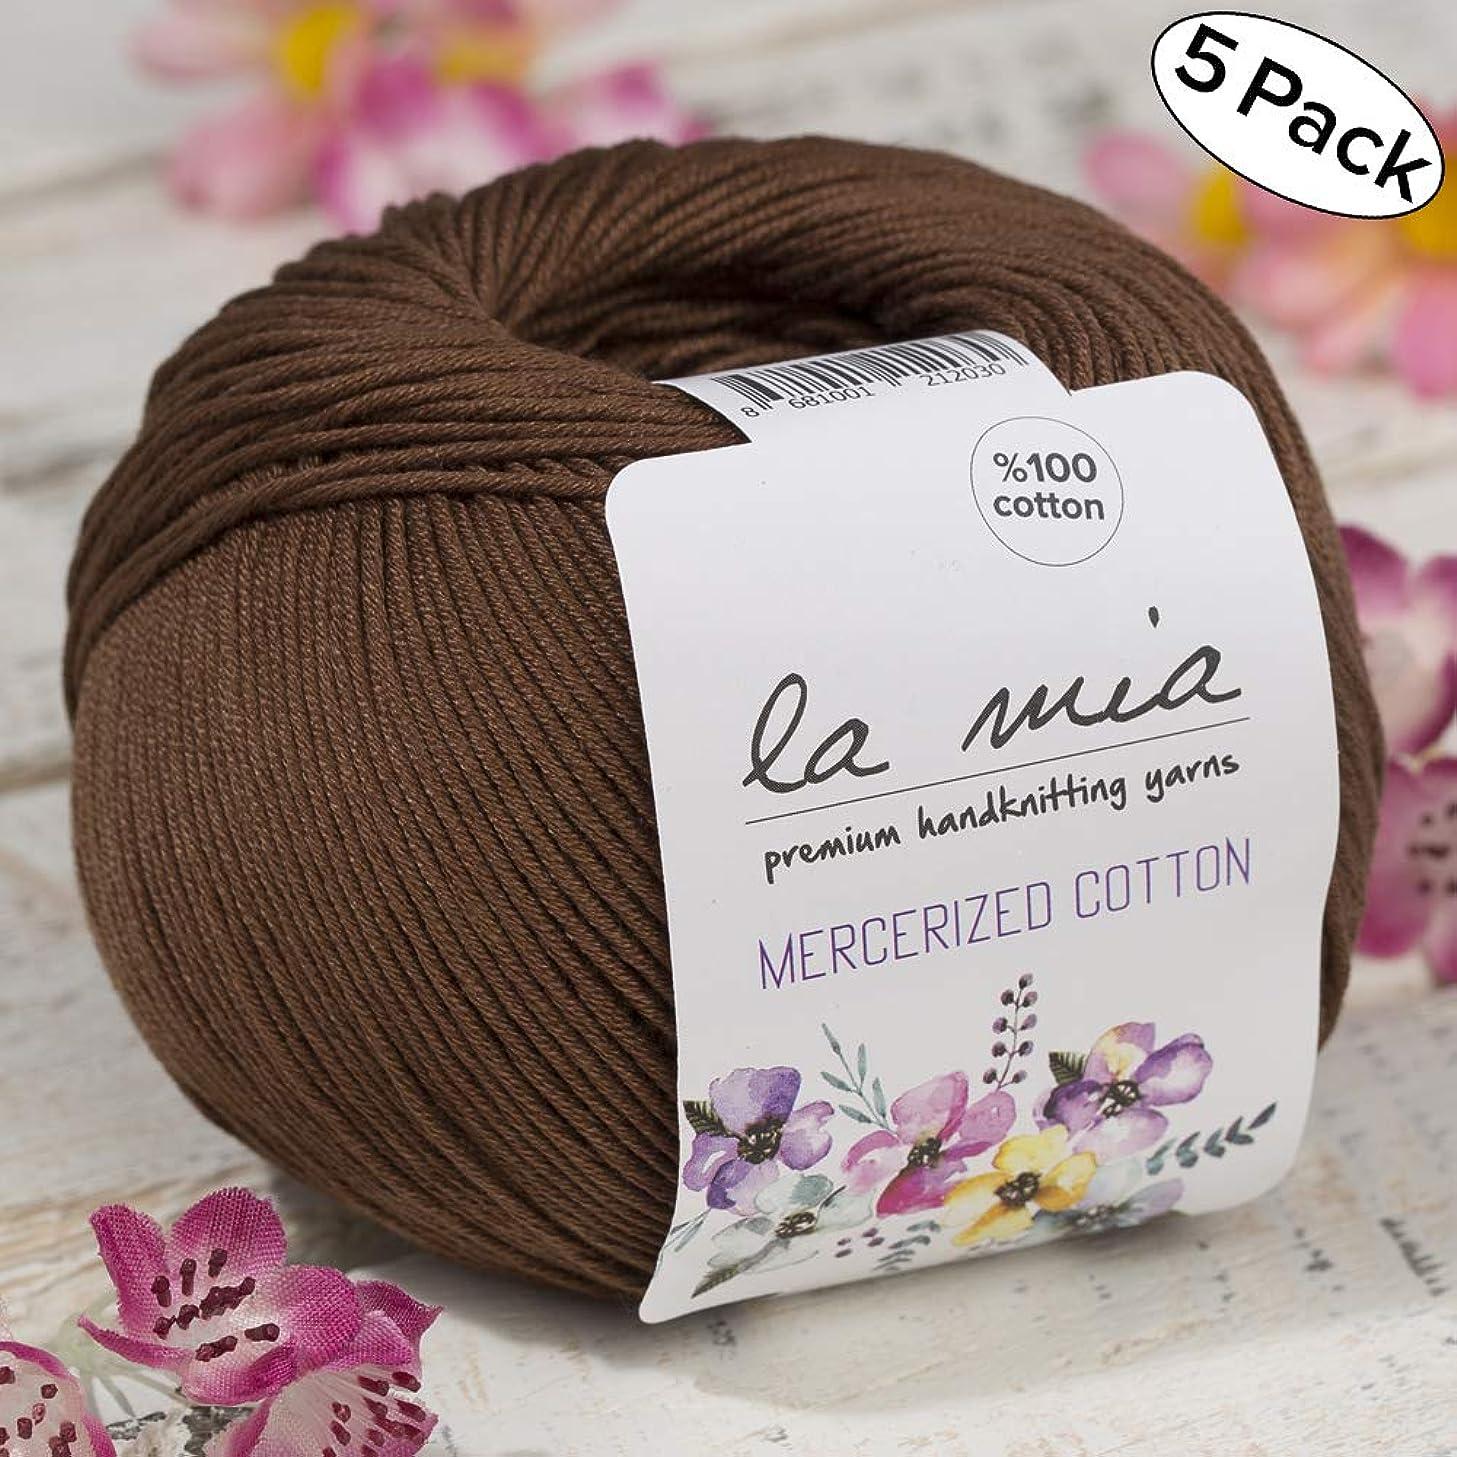 5 Ball%100 Mercerized Cotton Total 8.8 oz. Each 1.76 oz (50g) / 147 Yrds (135m) Super Soft, Dk Light Baby Yarn, Dark Brown - 228